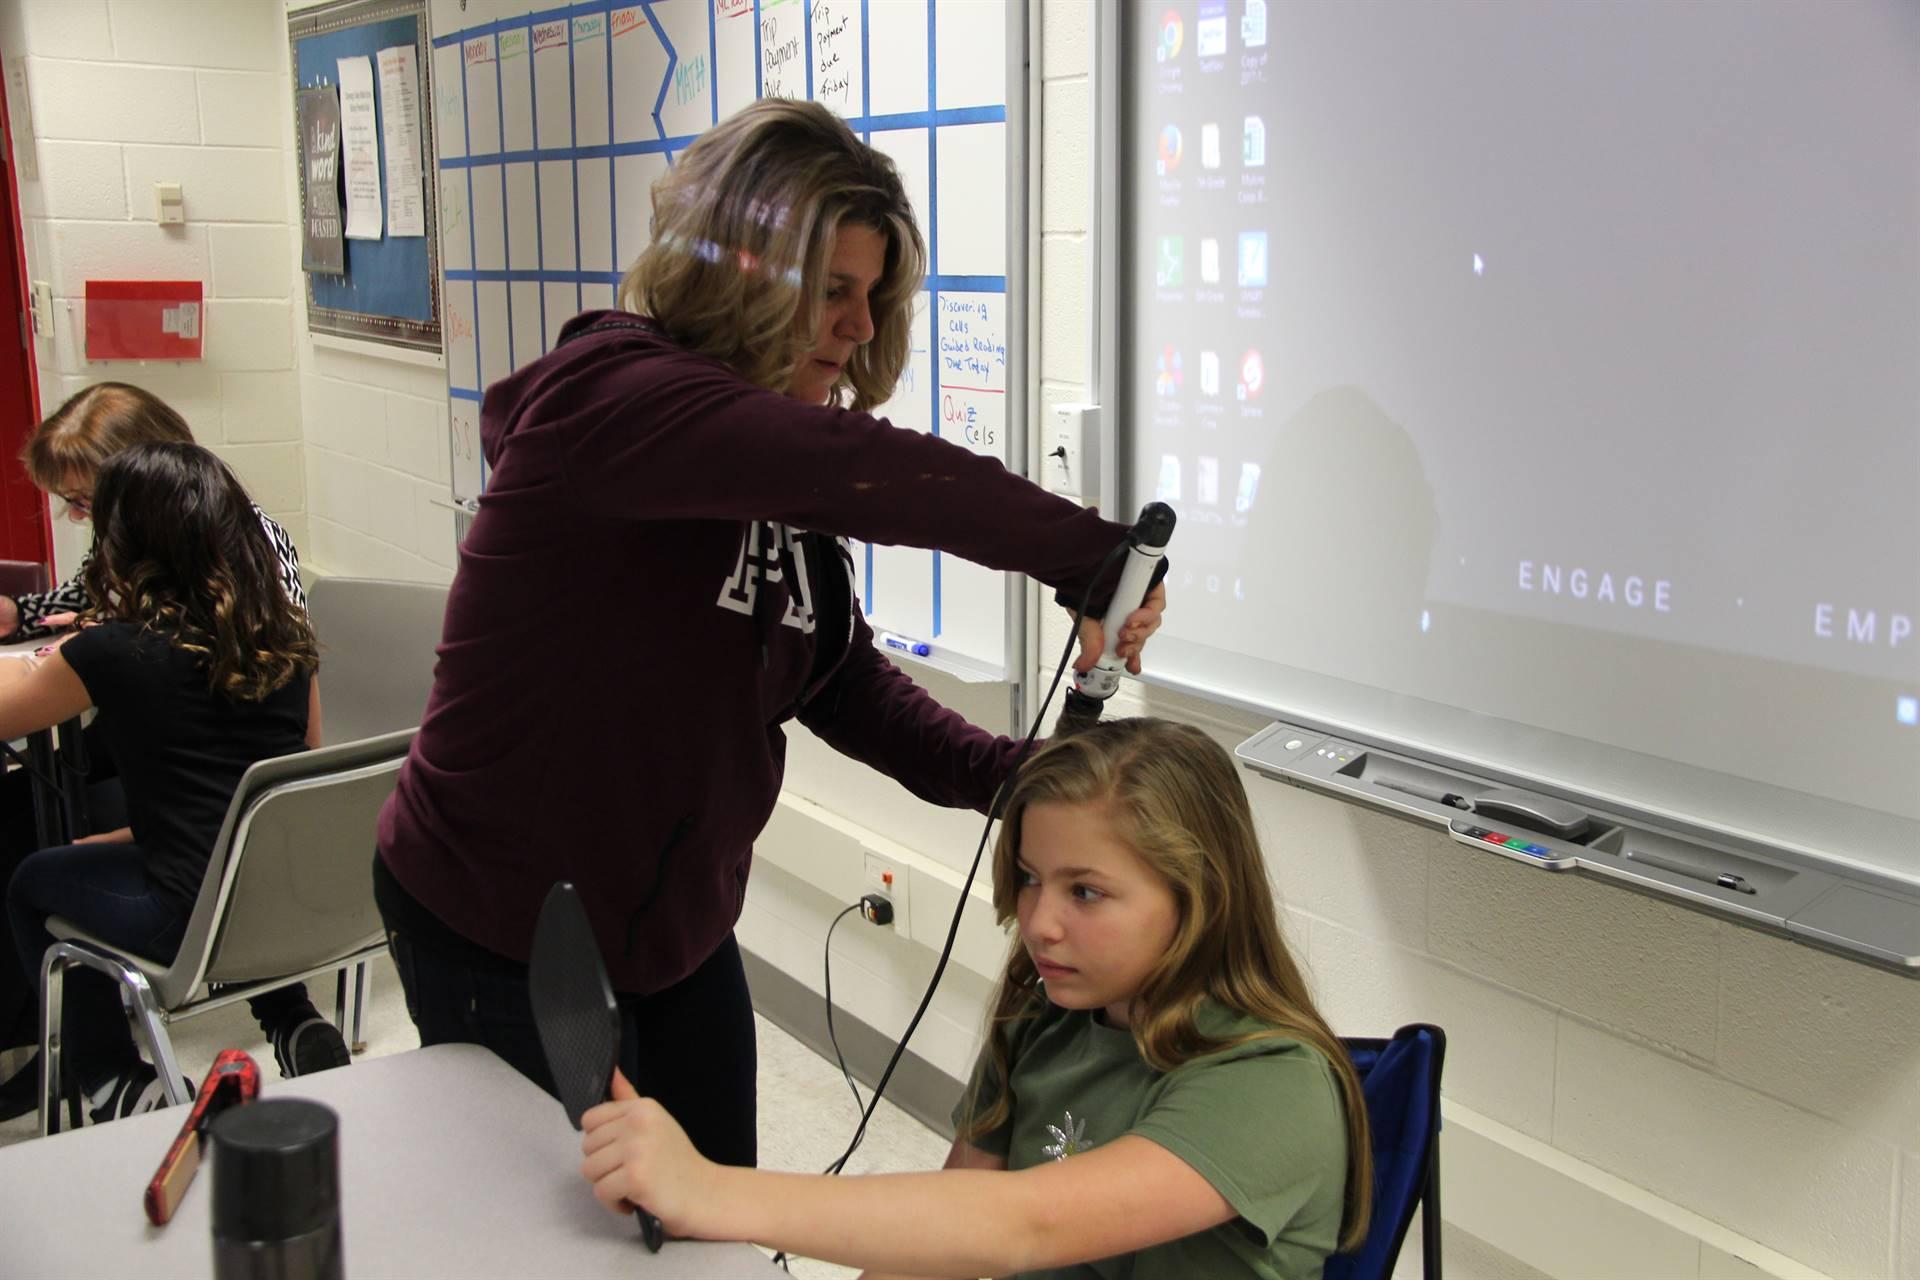 teacher curling students hair